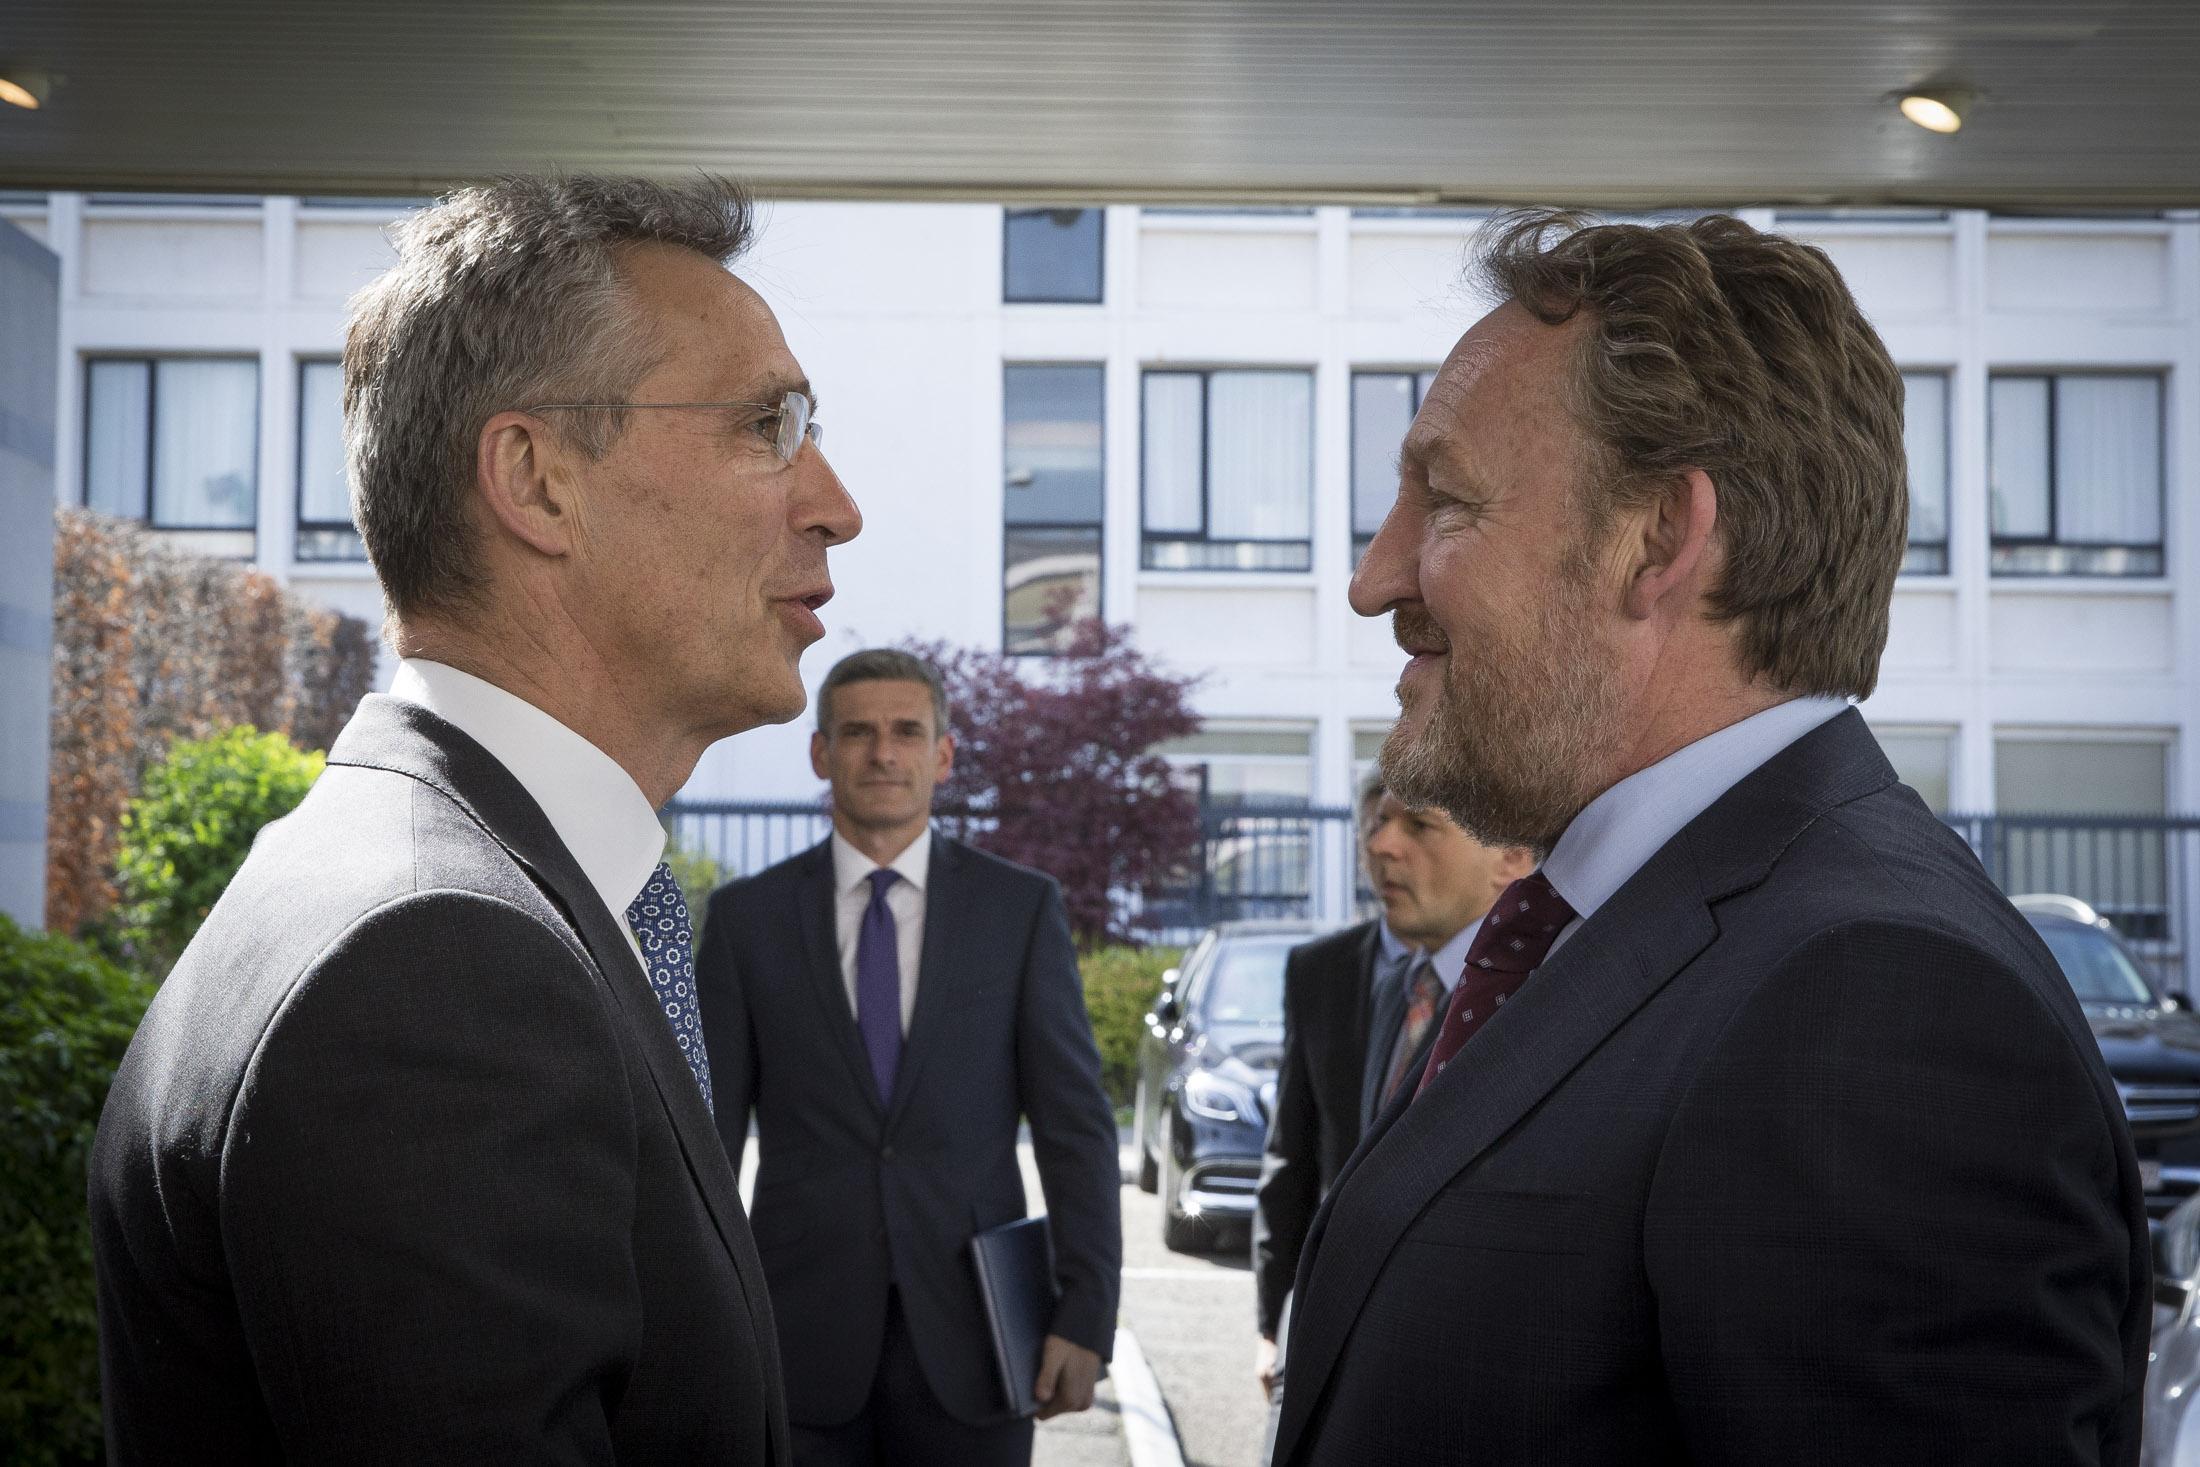 The Chairman of the Presidency of Bosnia and Herzegovina, Bakir Izetbegovic visits NATO and meets with NATO Secretary  General Jens Stoltenberg